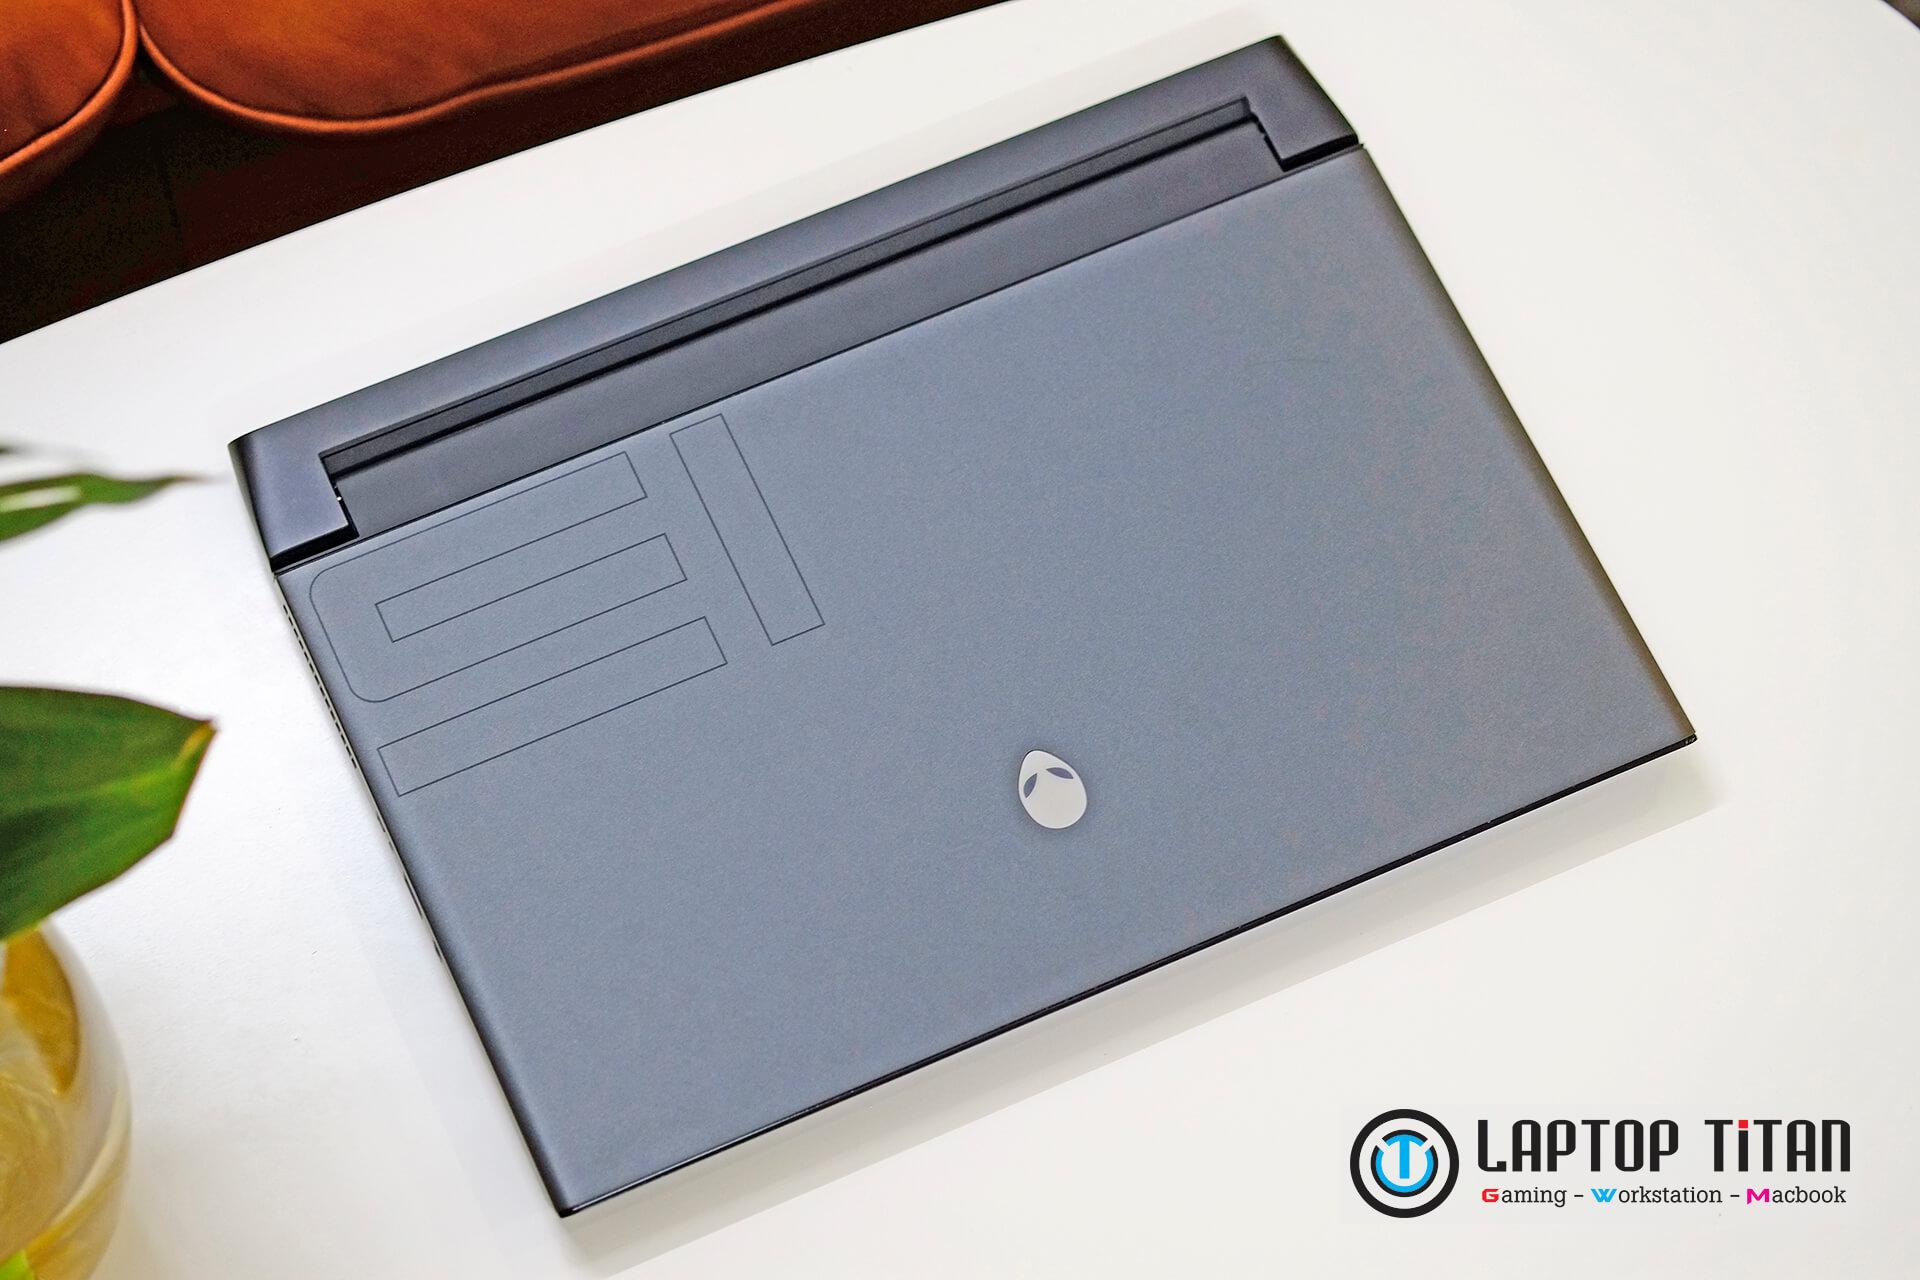 Dell Alienware M15 R3 Laptoptitan 06